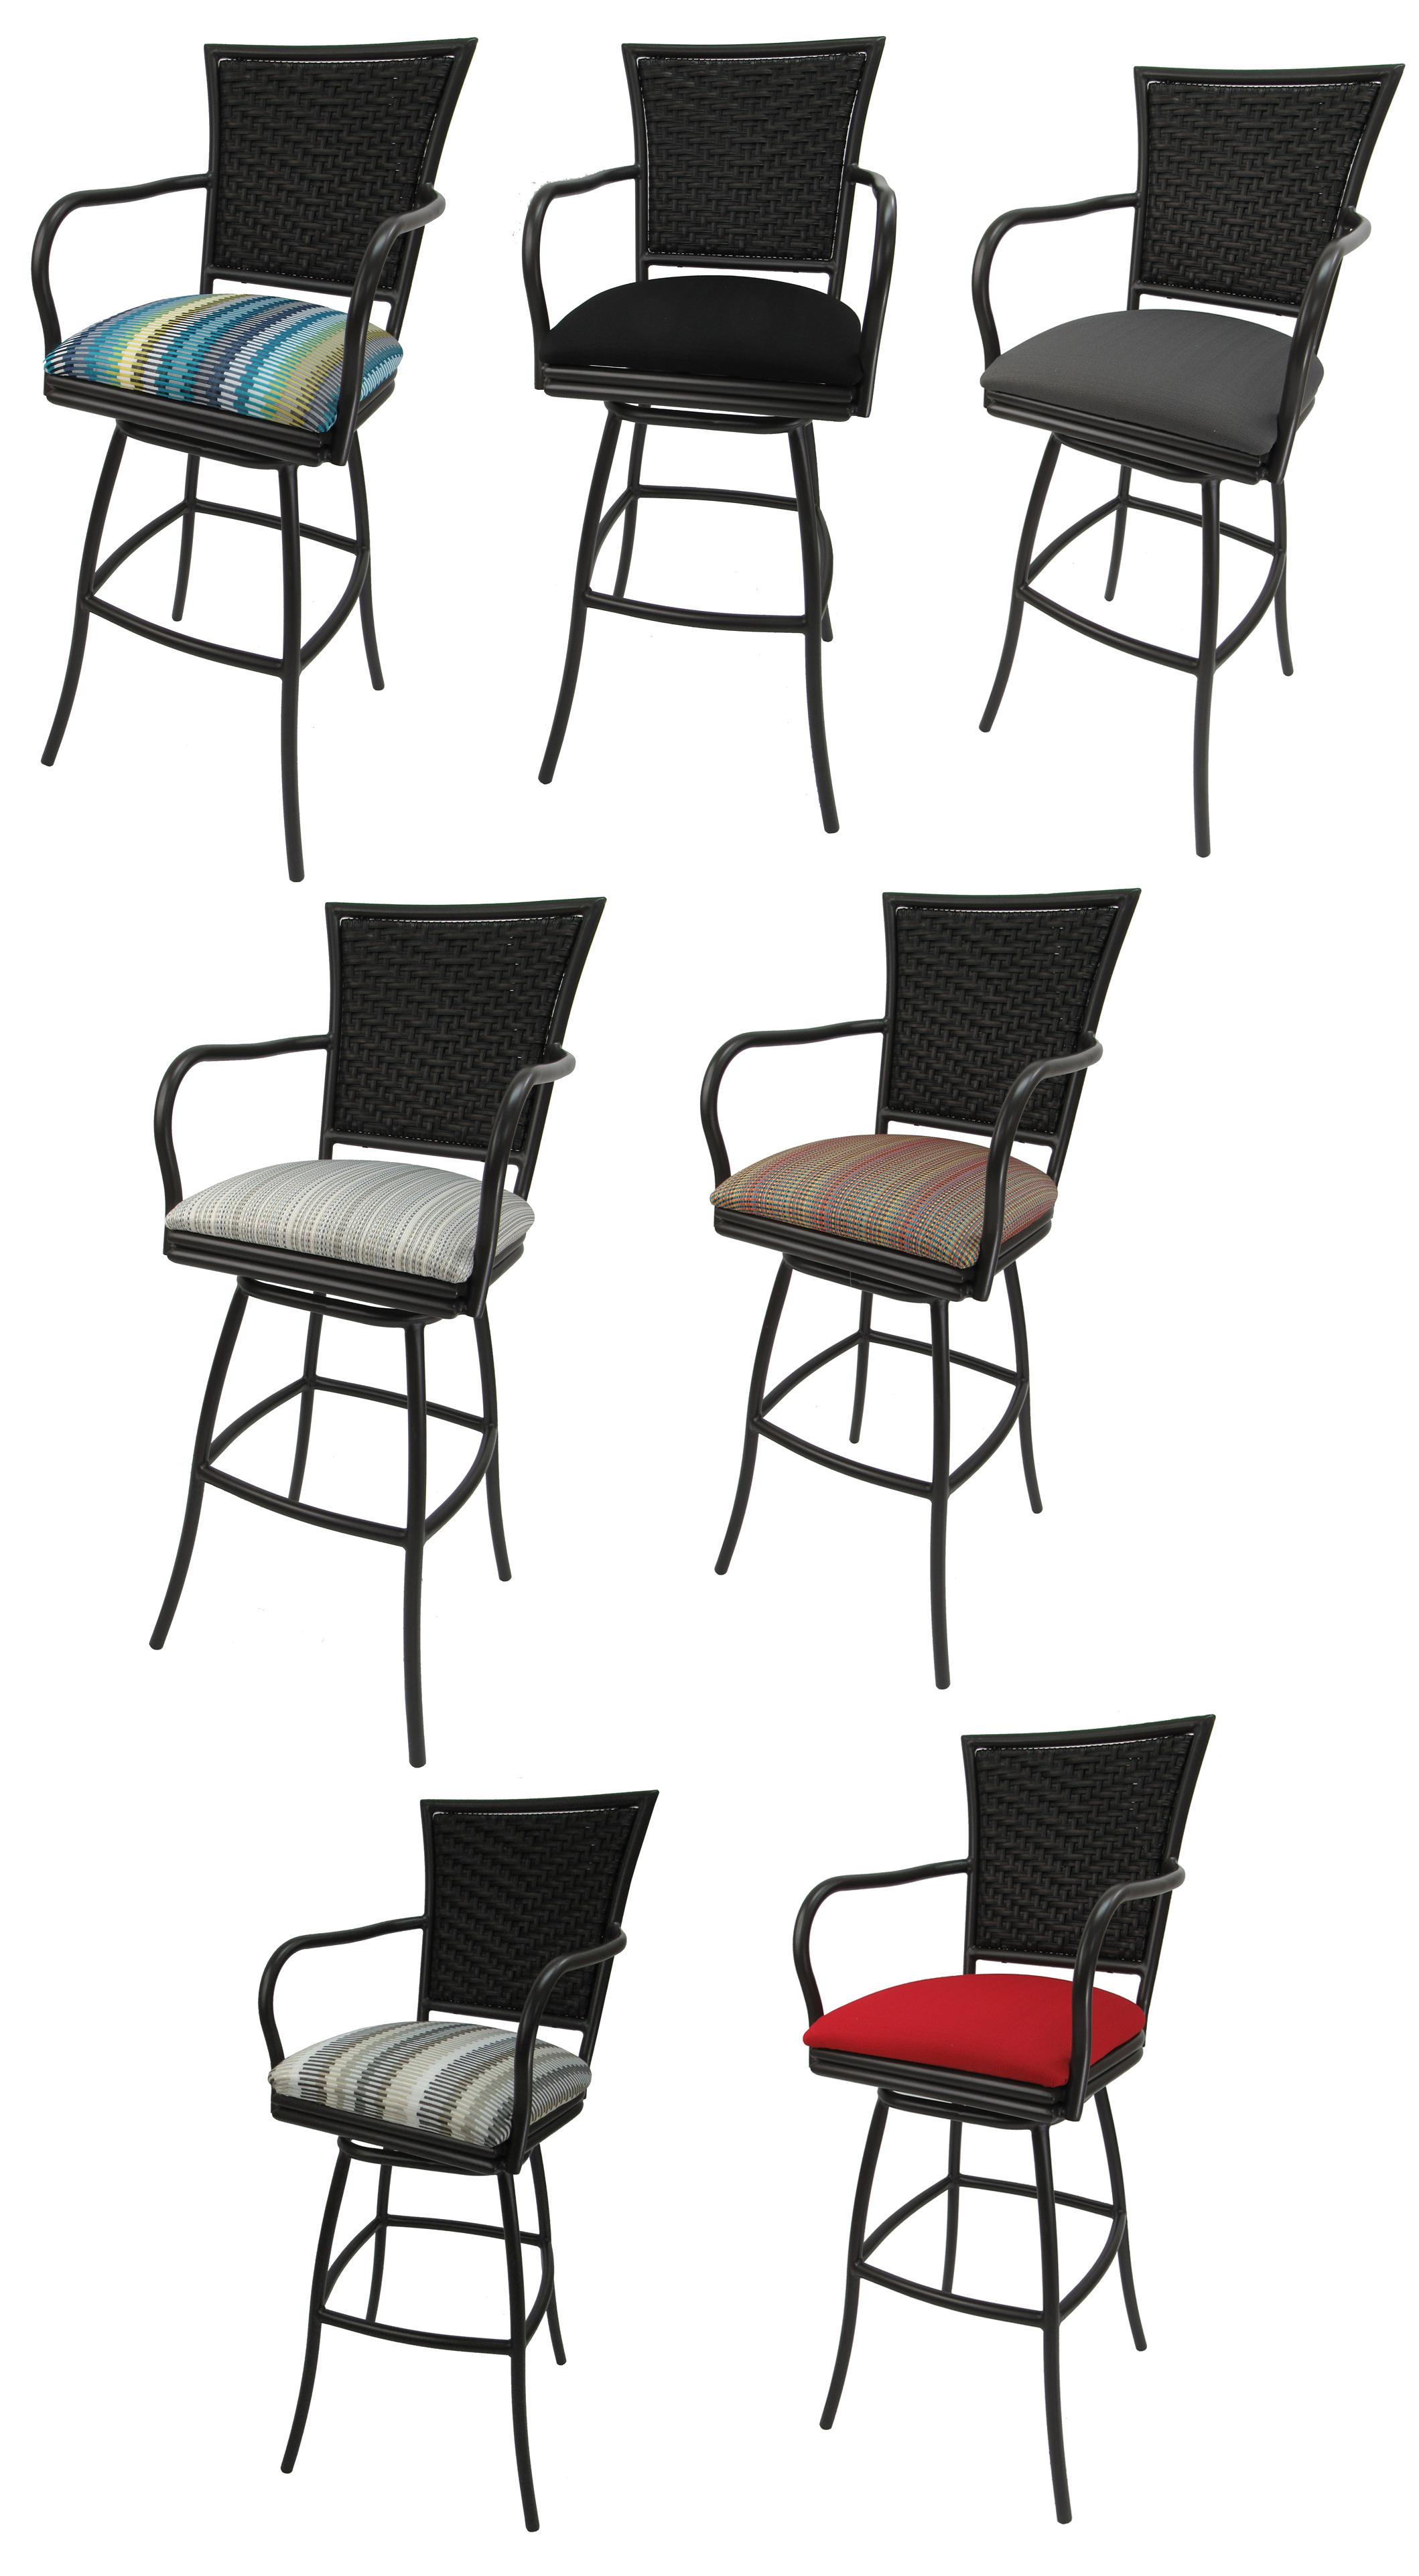 patio furniture accessories aqua